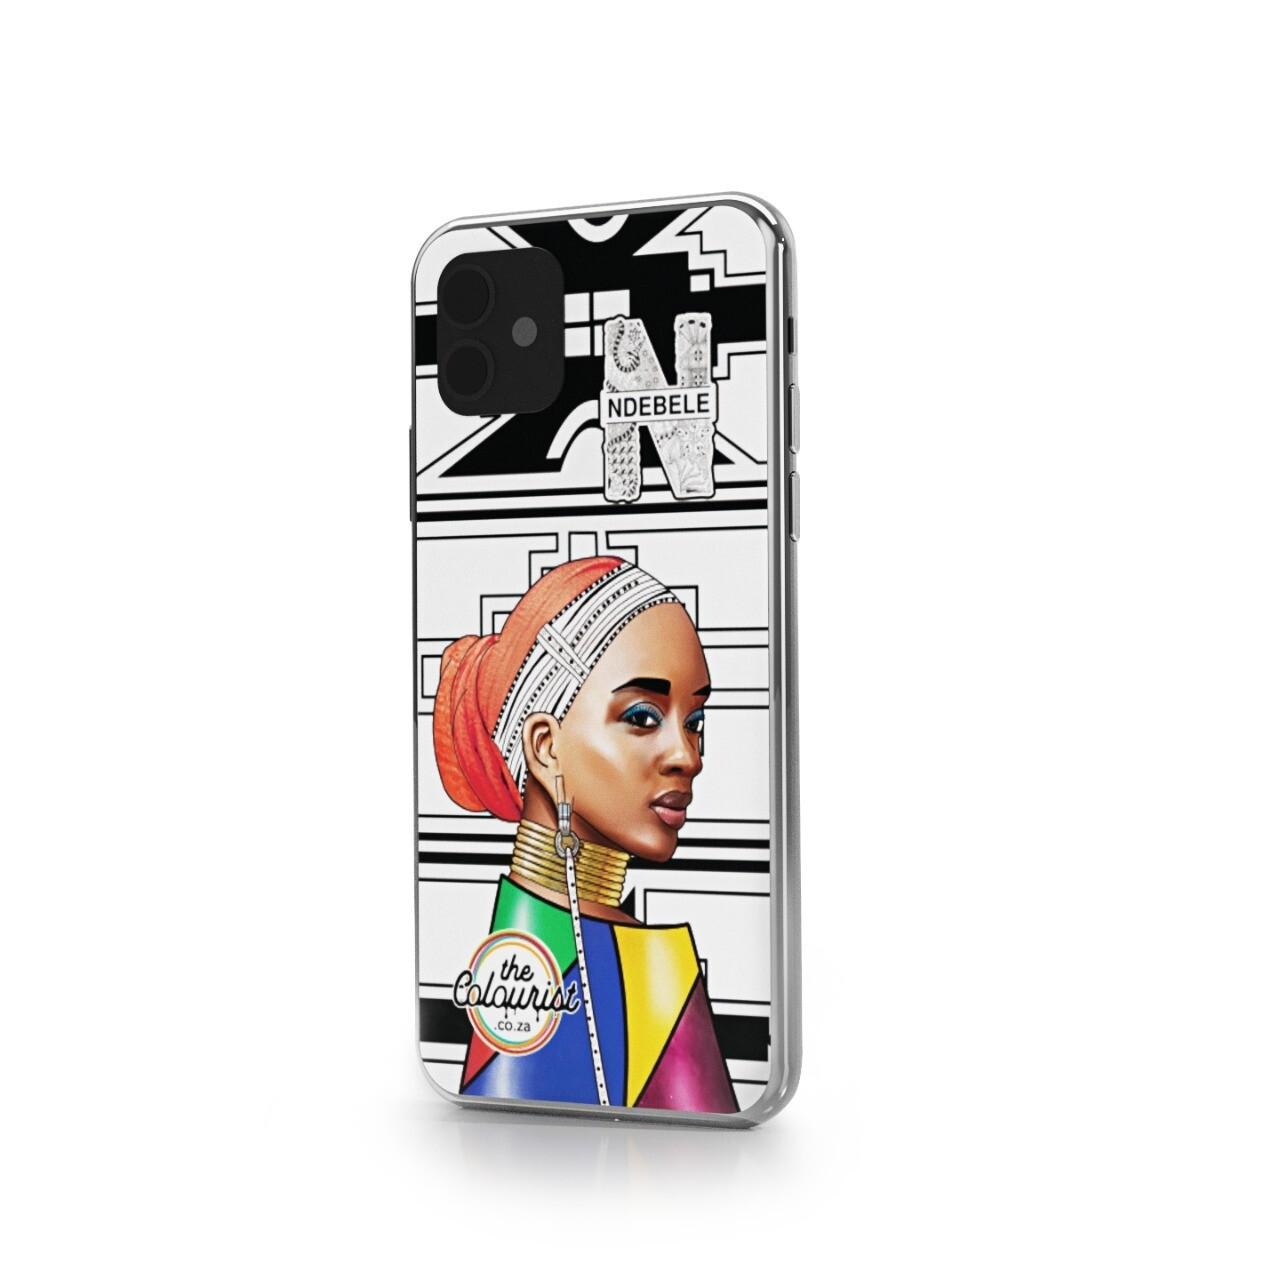 Ndebele Cover